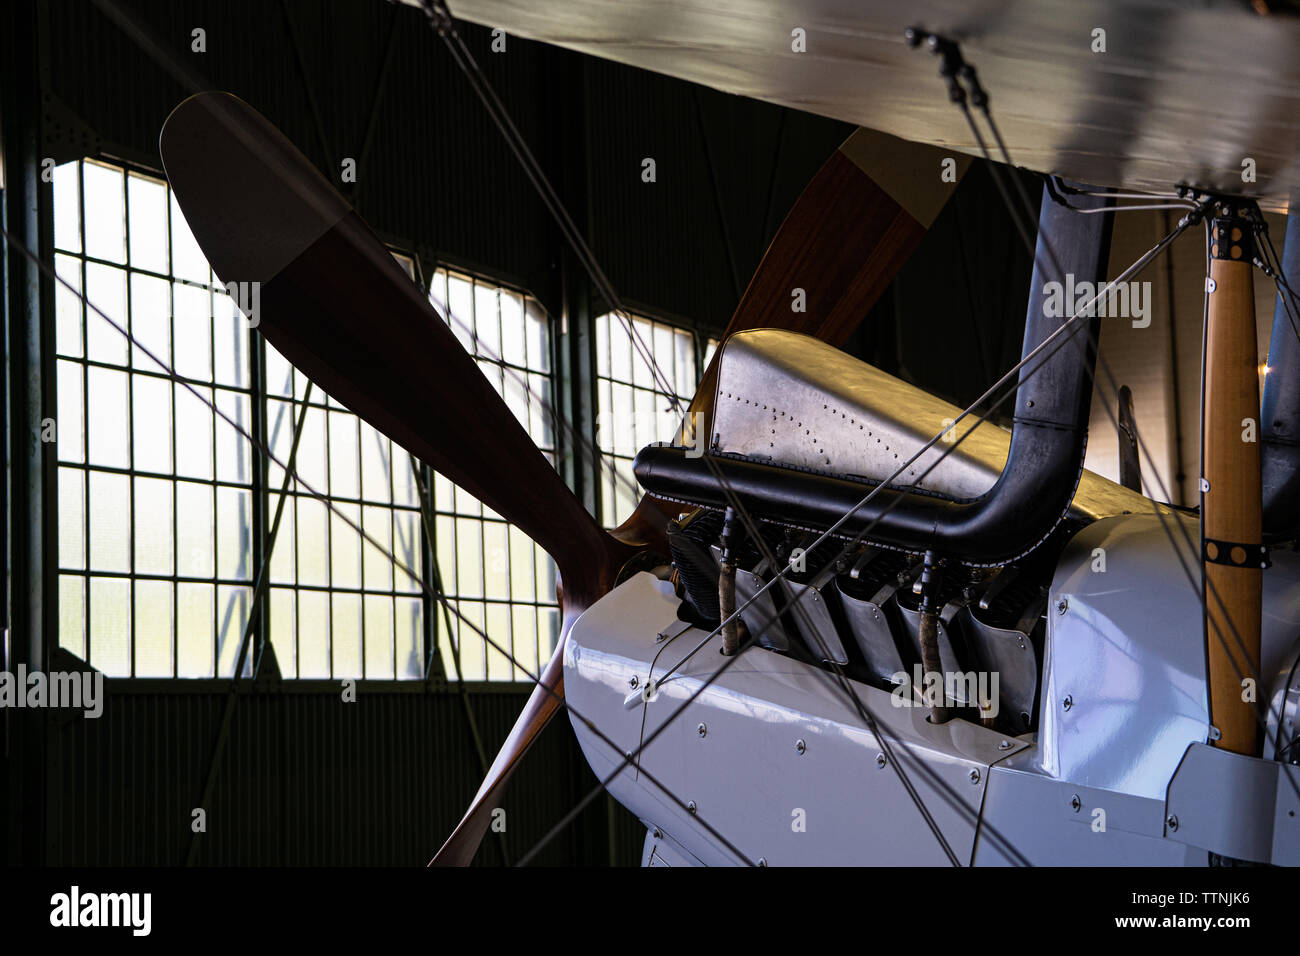 Historic bi-plane silhouette / rim-lit inside a hangar - Stock Image